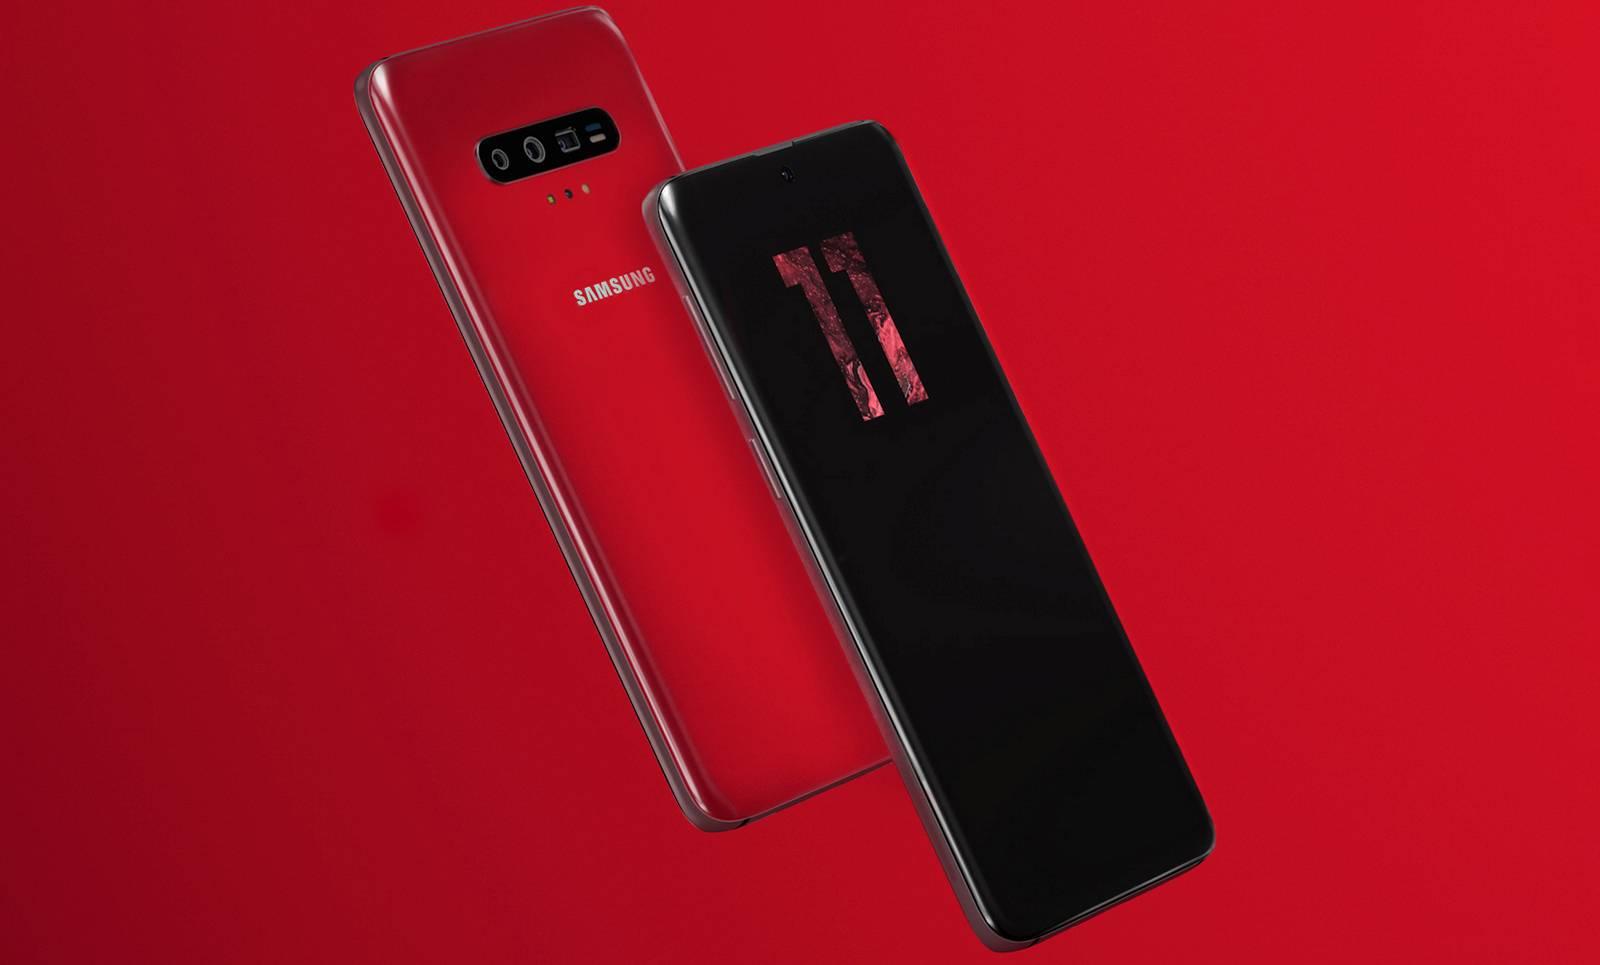 Samsung GALAXY S11 video 8k iphone